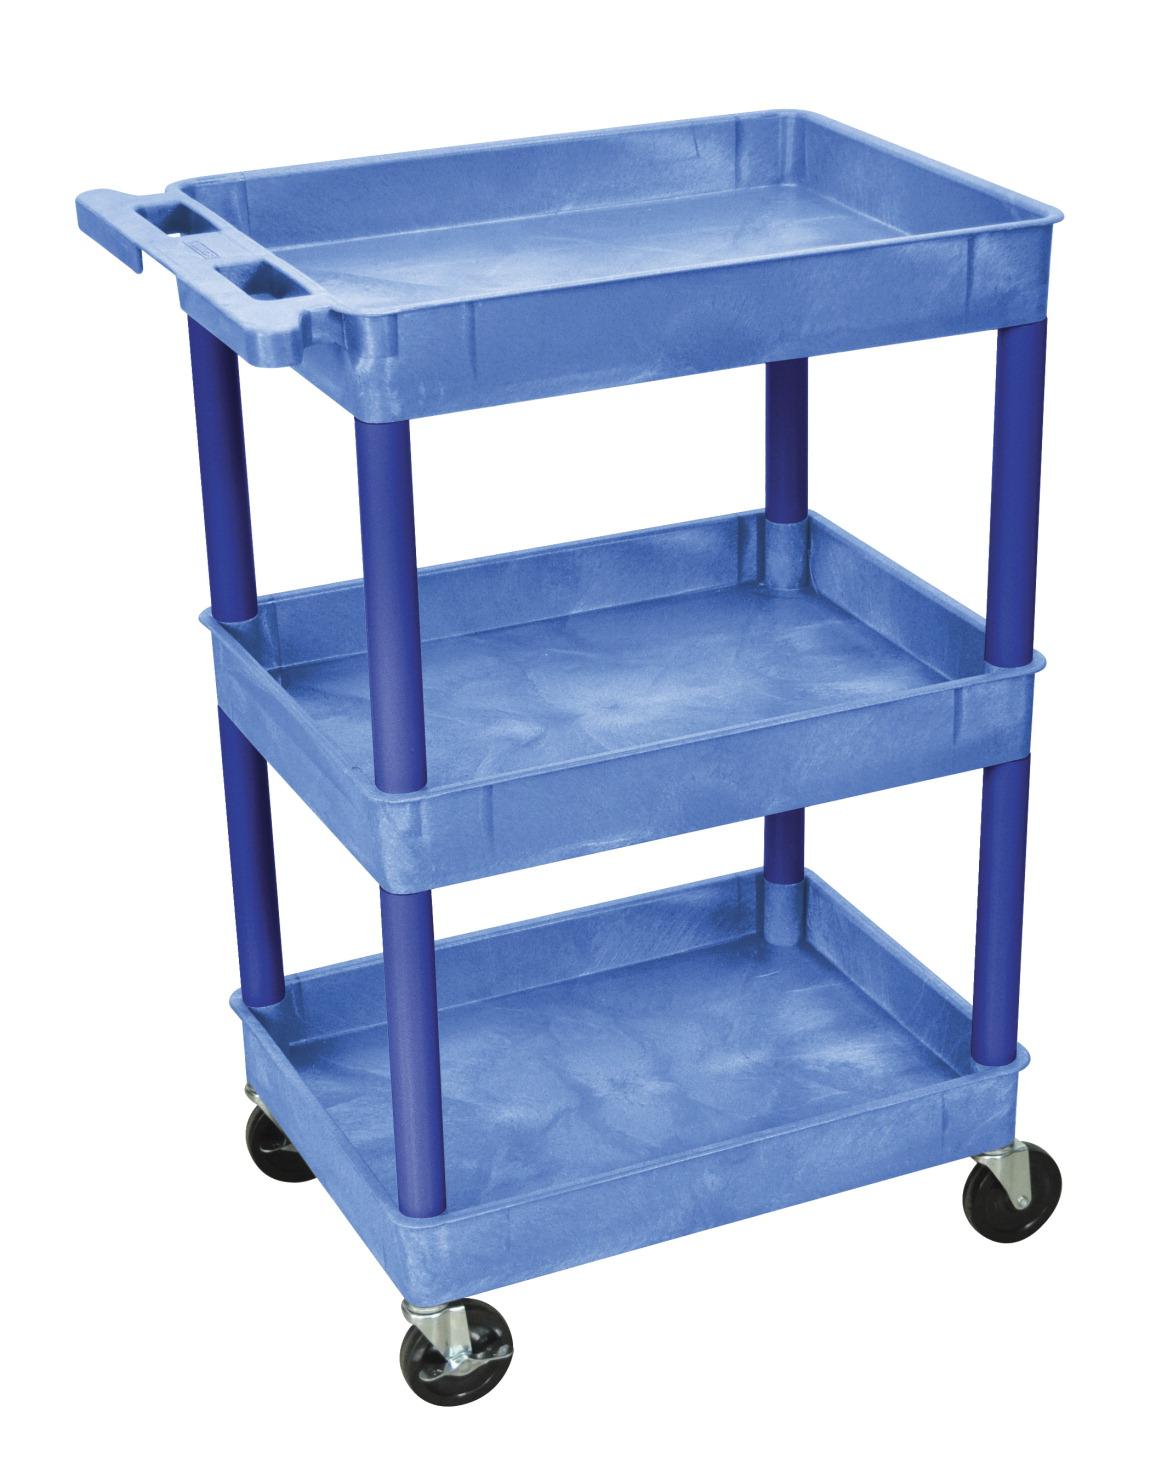 Utility Tub Cart - SCHOOL SPECIALTY MARKETPLACE